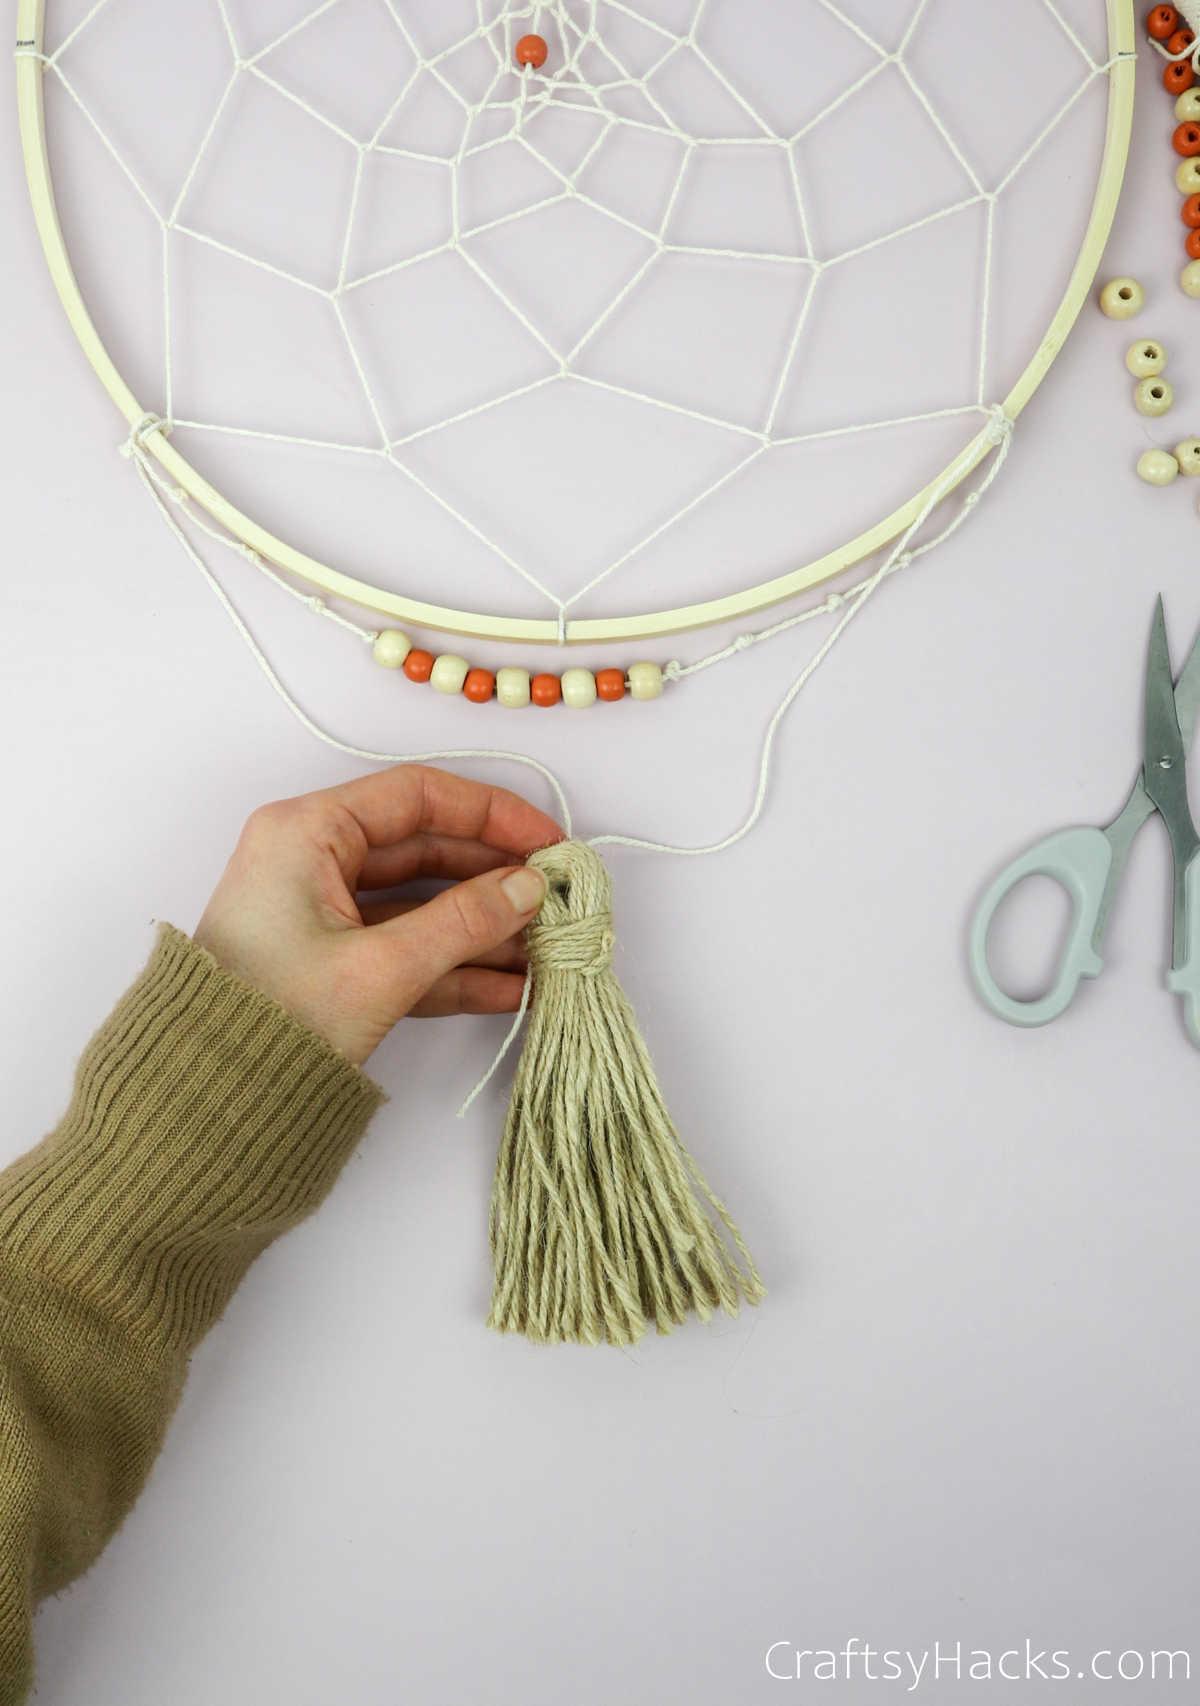 attaching tassle to string